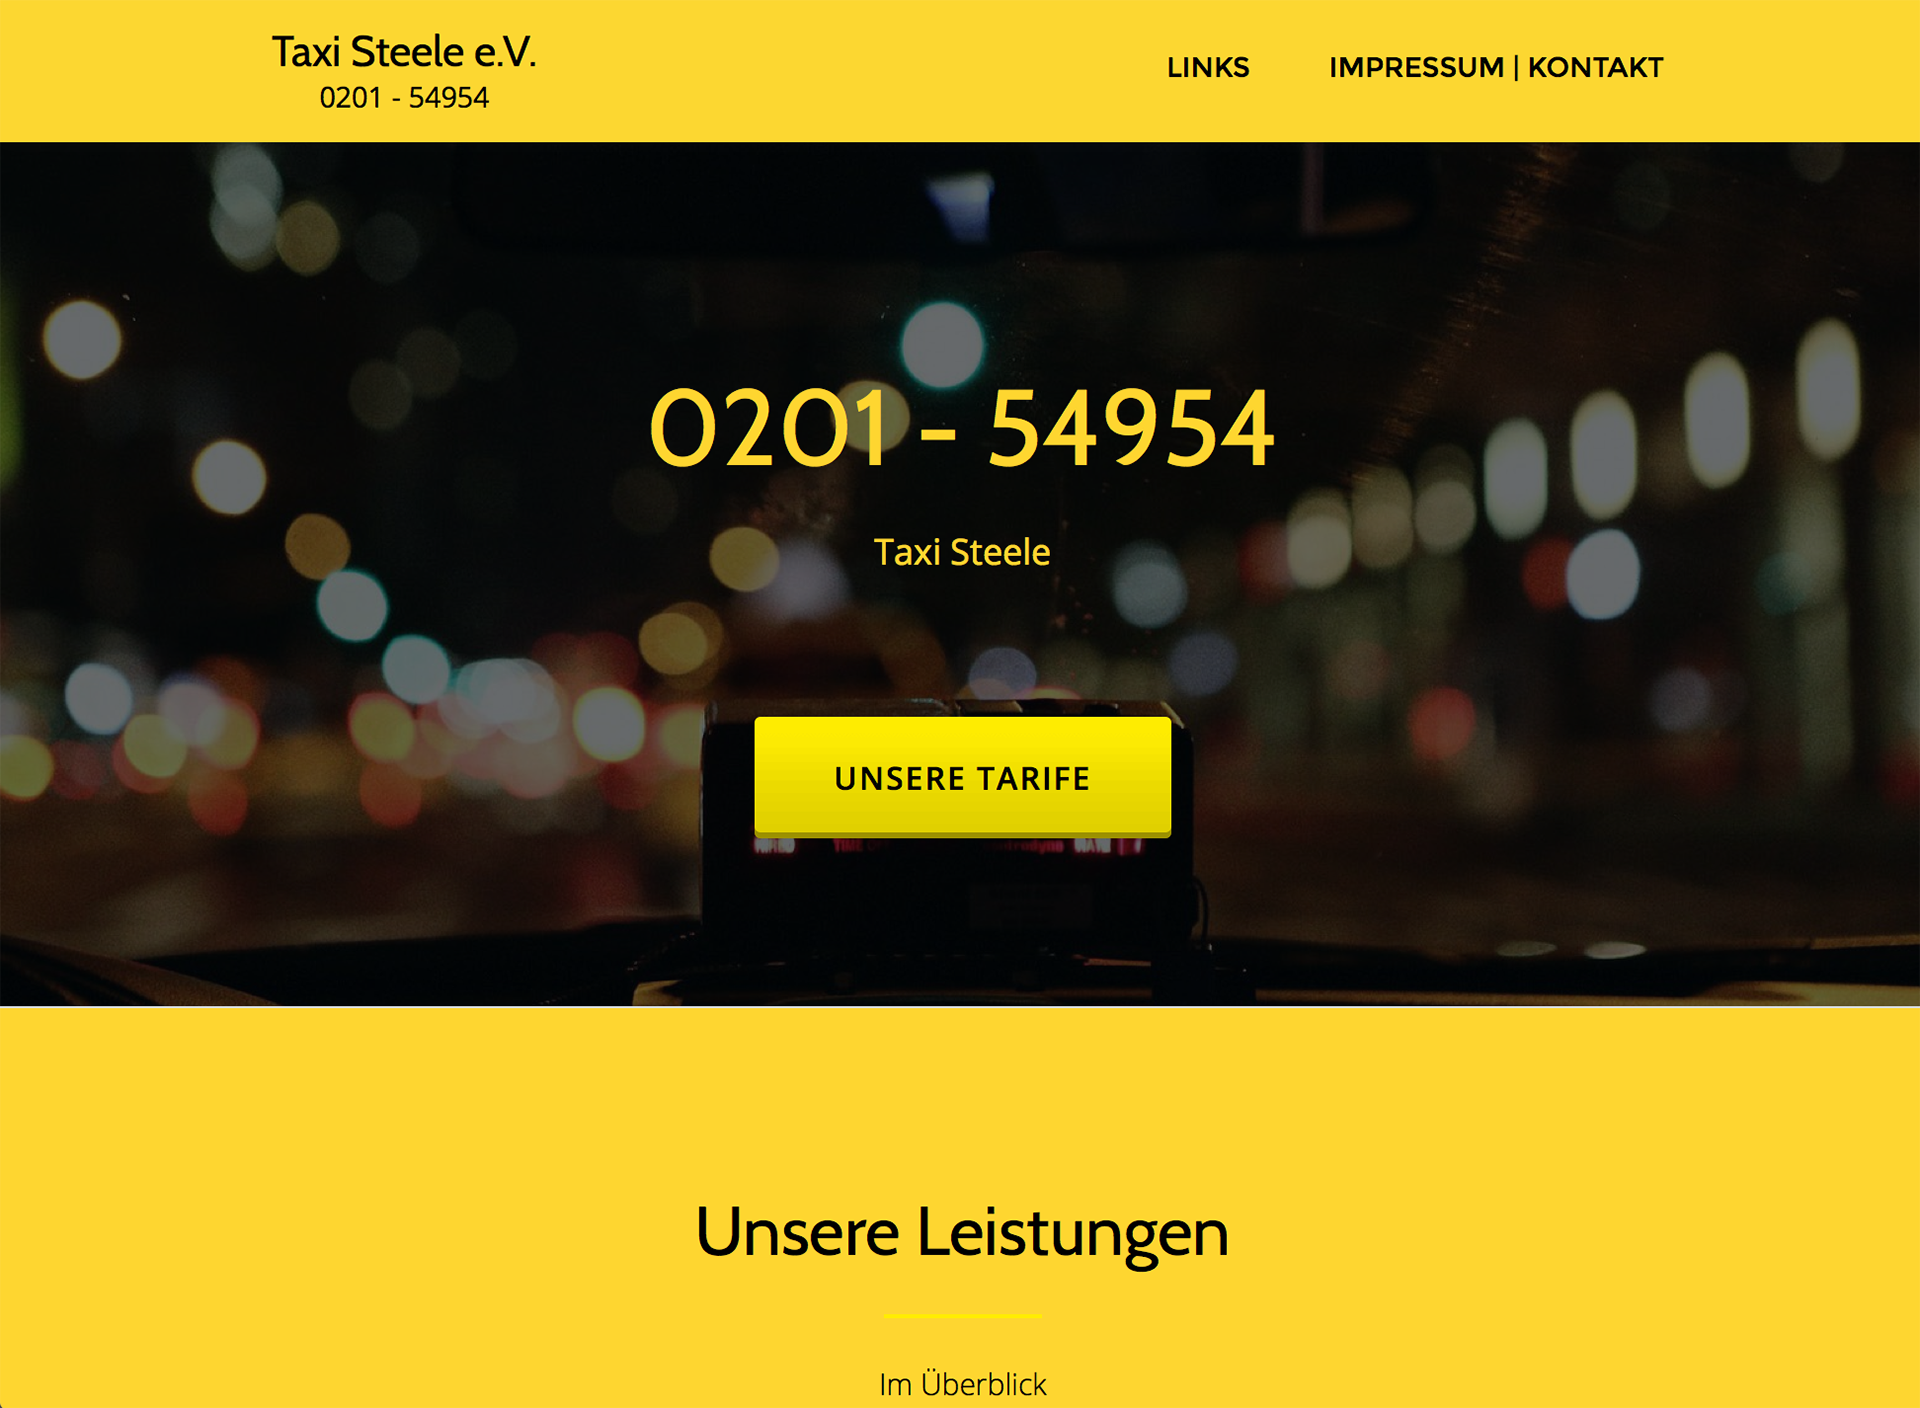 responsive webdesign, taxi steele,taxi-steele.de,taxi überruht, taxiunternehmen,website,responsive webdesign,redesign,webseiten,internetseiten,gestalten,mediengestaltung,grafikdesign ruhrgebiet, waldbrand® media